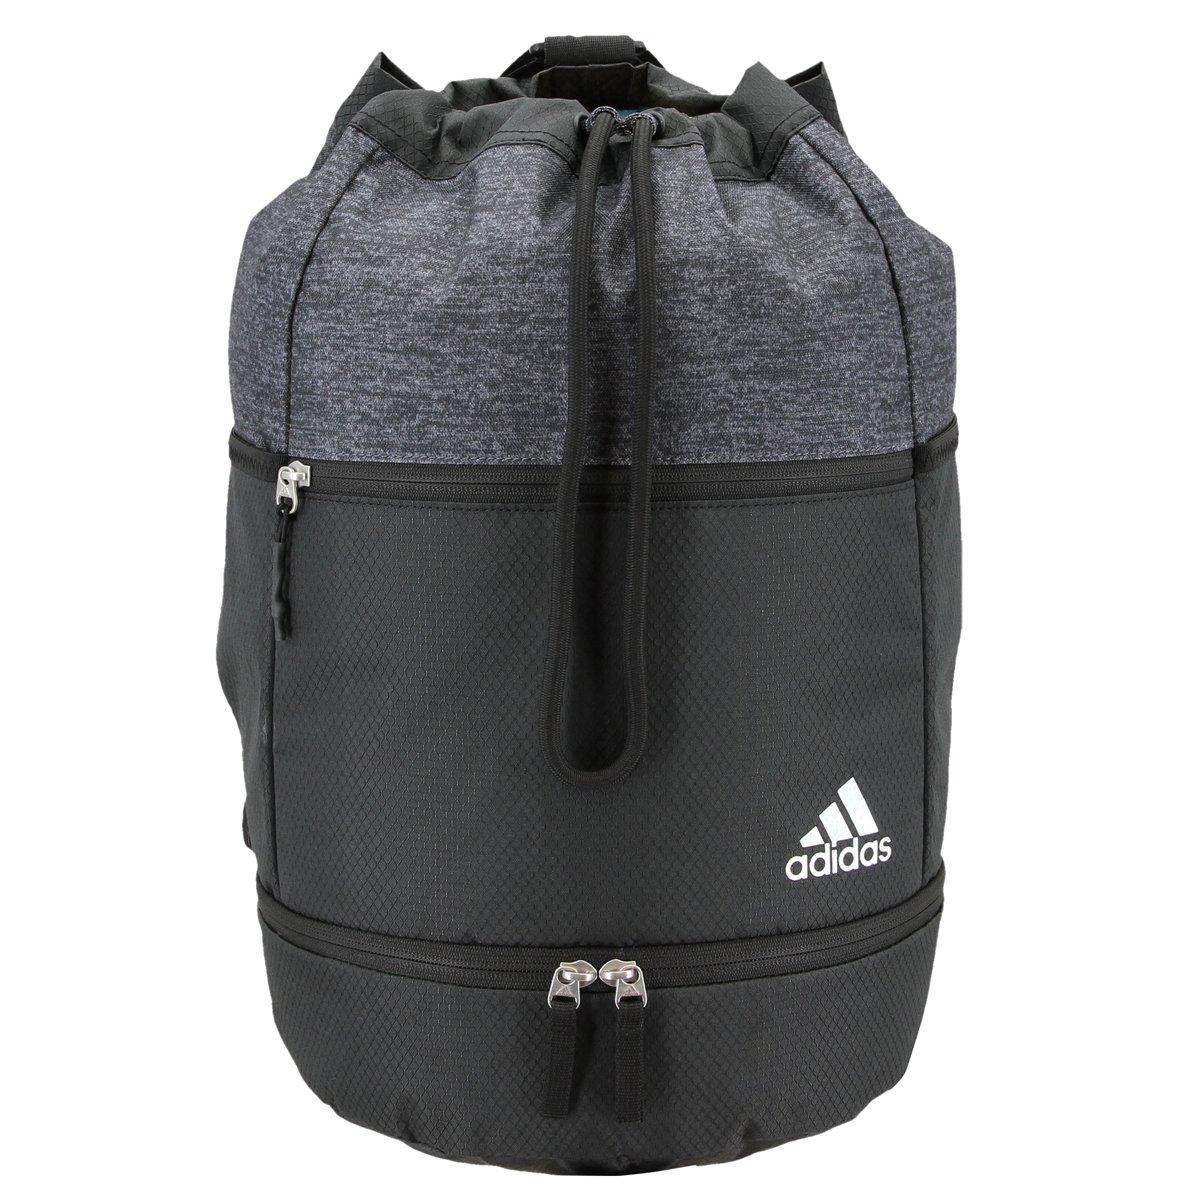 ce73386ade Amazon.com  adidas Womens Squad Bucket Backpack